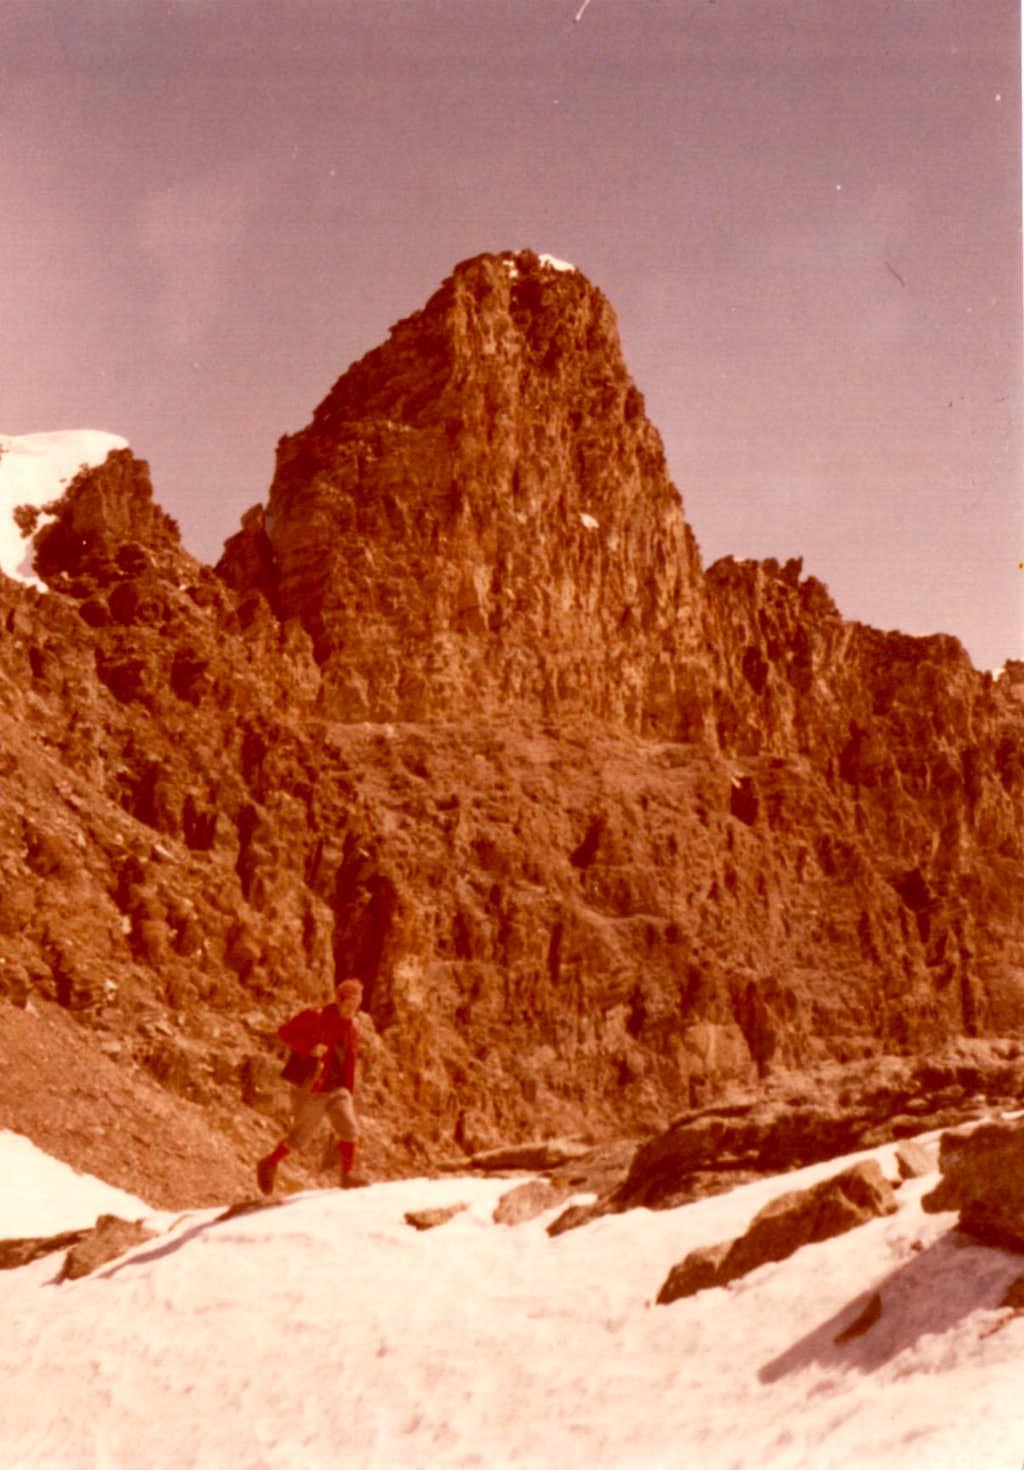 ToPERCIA's SOUTH SUMMIT (3209m) GARIBALDIANstep